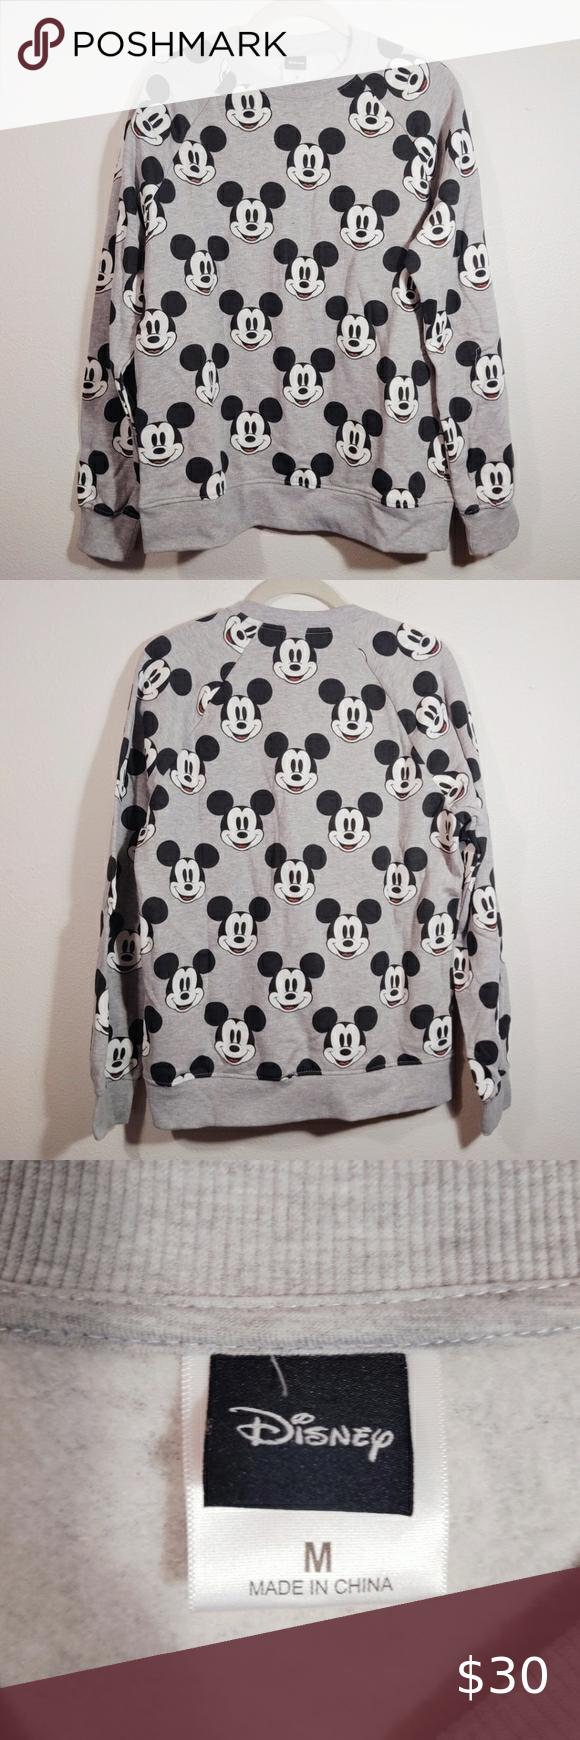 Disney Mickey Mouse Crewneck Sweatshirt M Crew Neck Sweatshirt Disney Mickey Mouse Disney Mickey [ 1740 x 580 Pixel ]